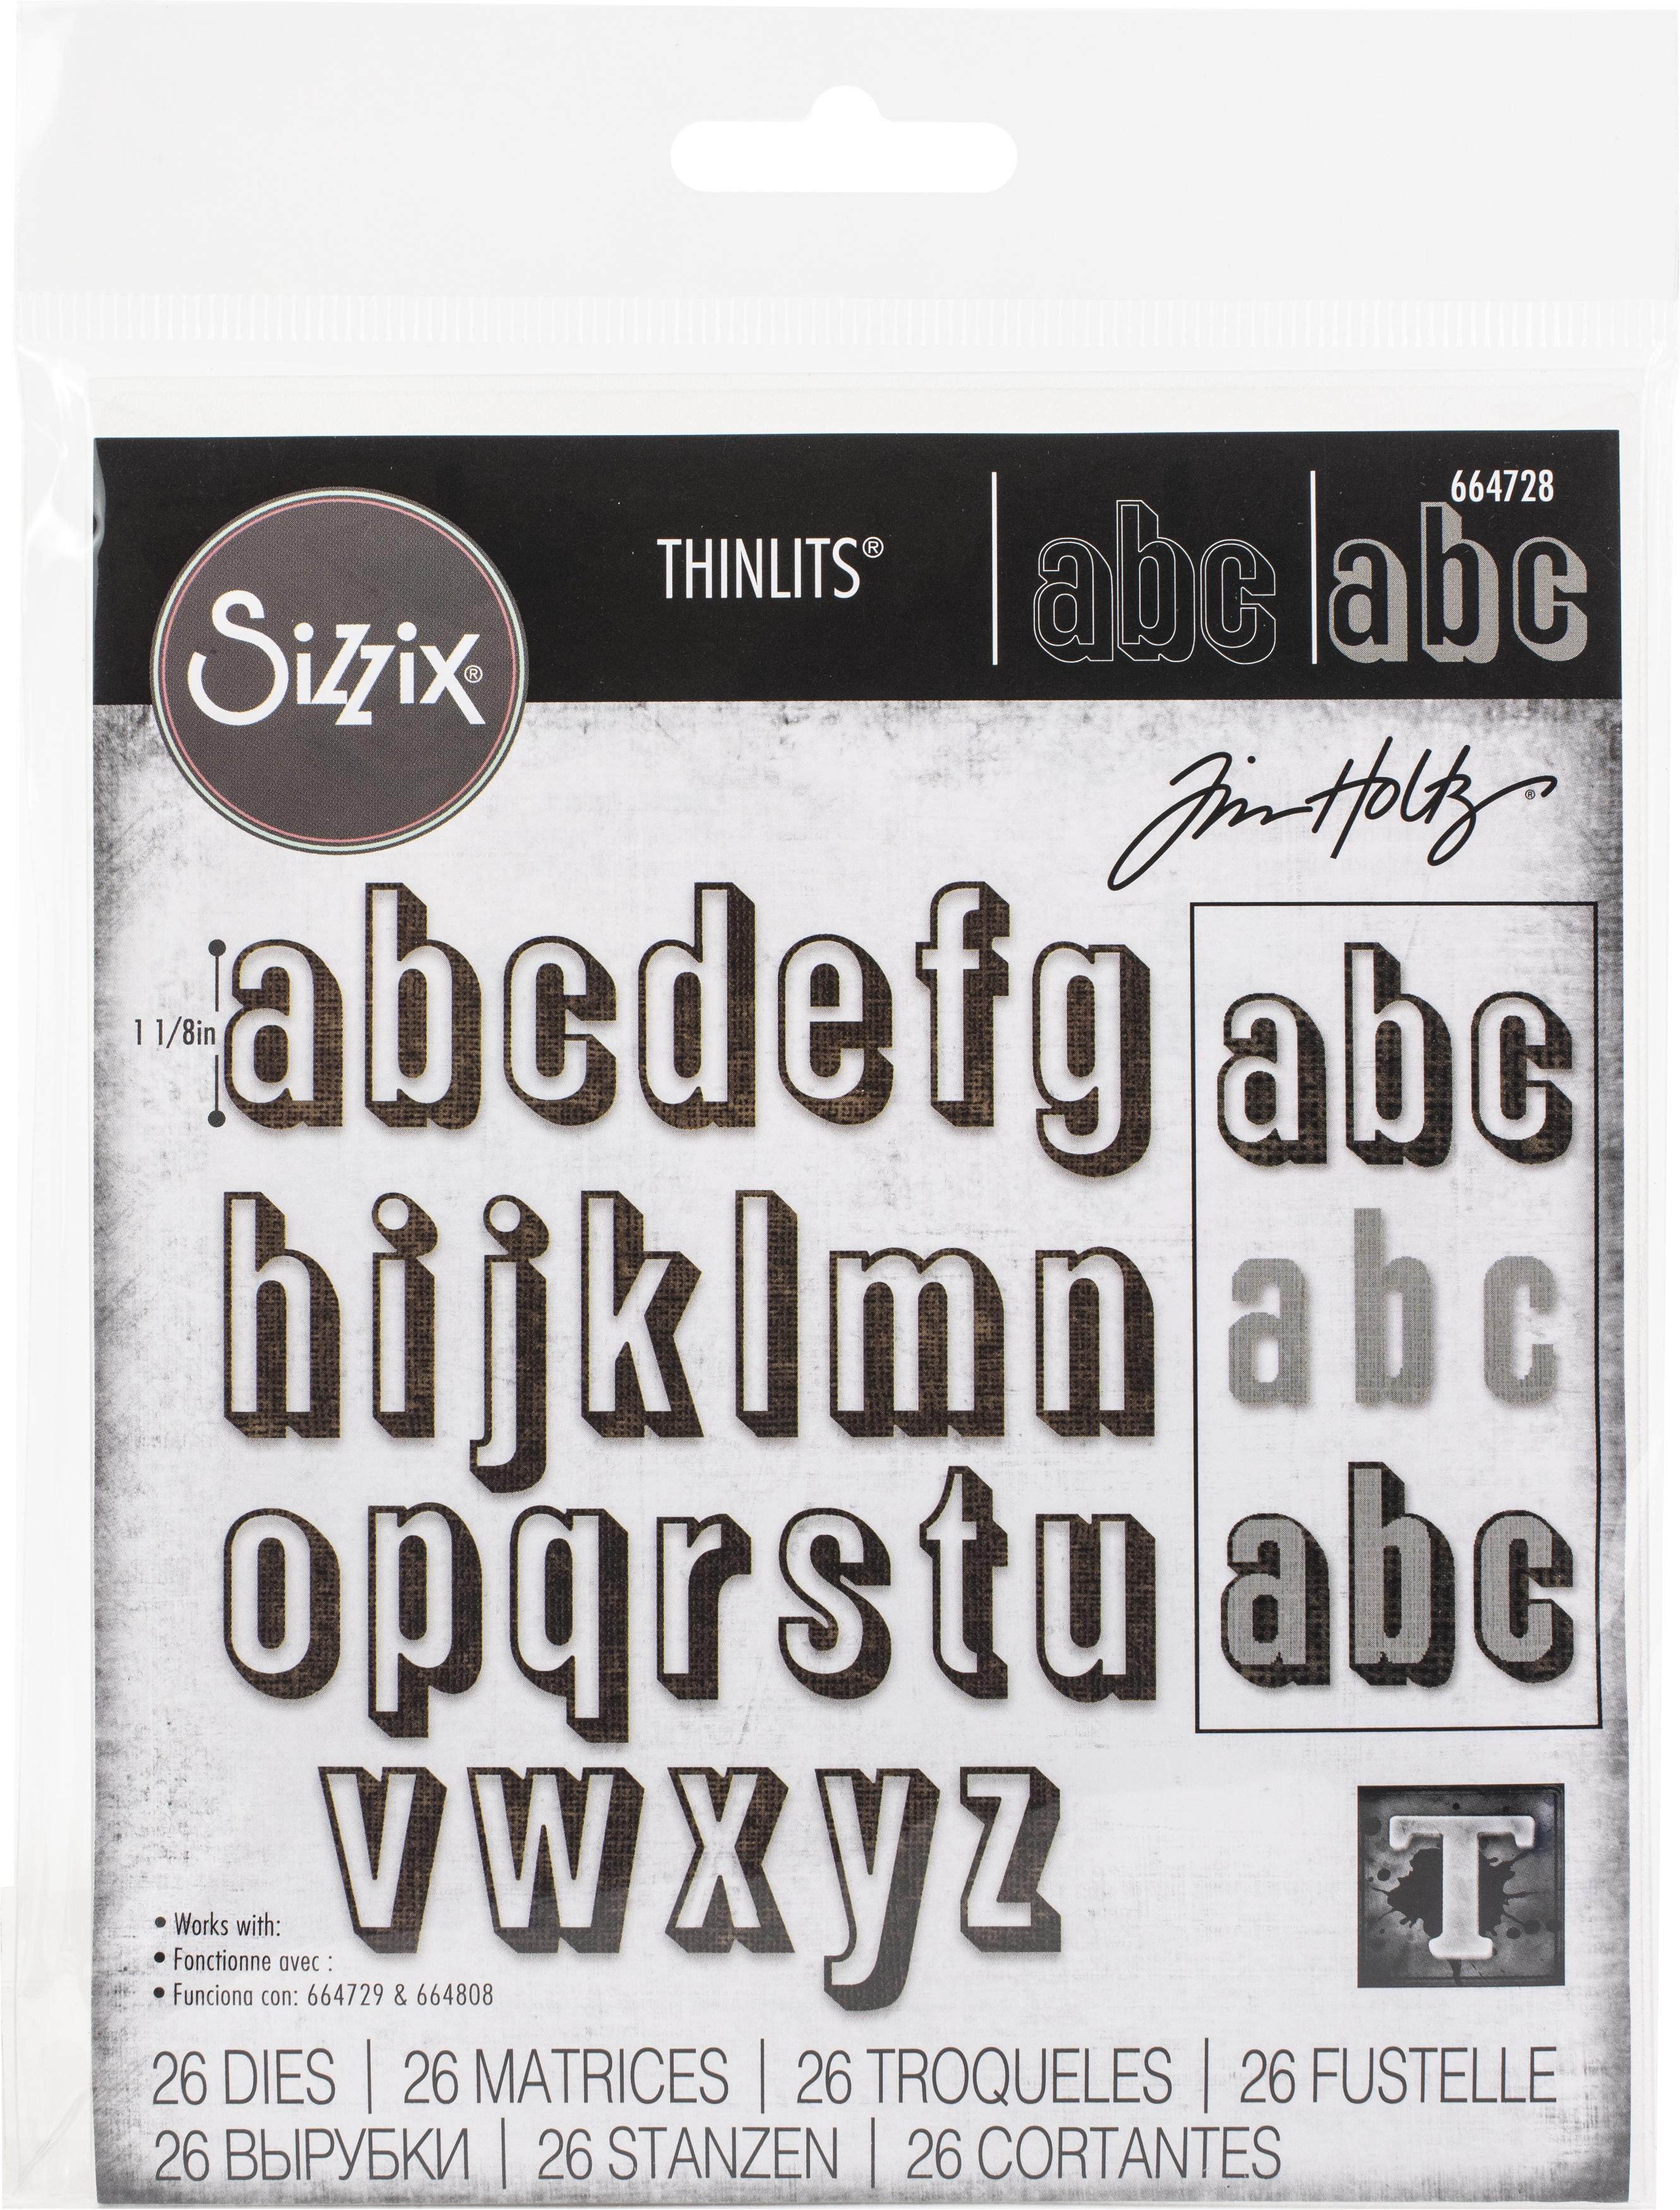 Sizzix Thinlits Dies - Alphanumeric Shadow Lower by Tim Holtz